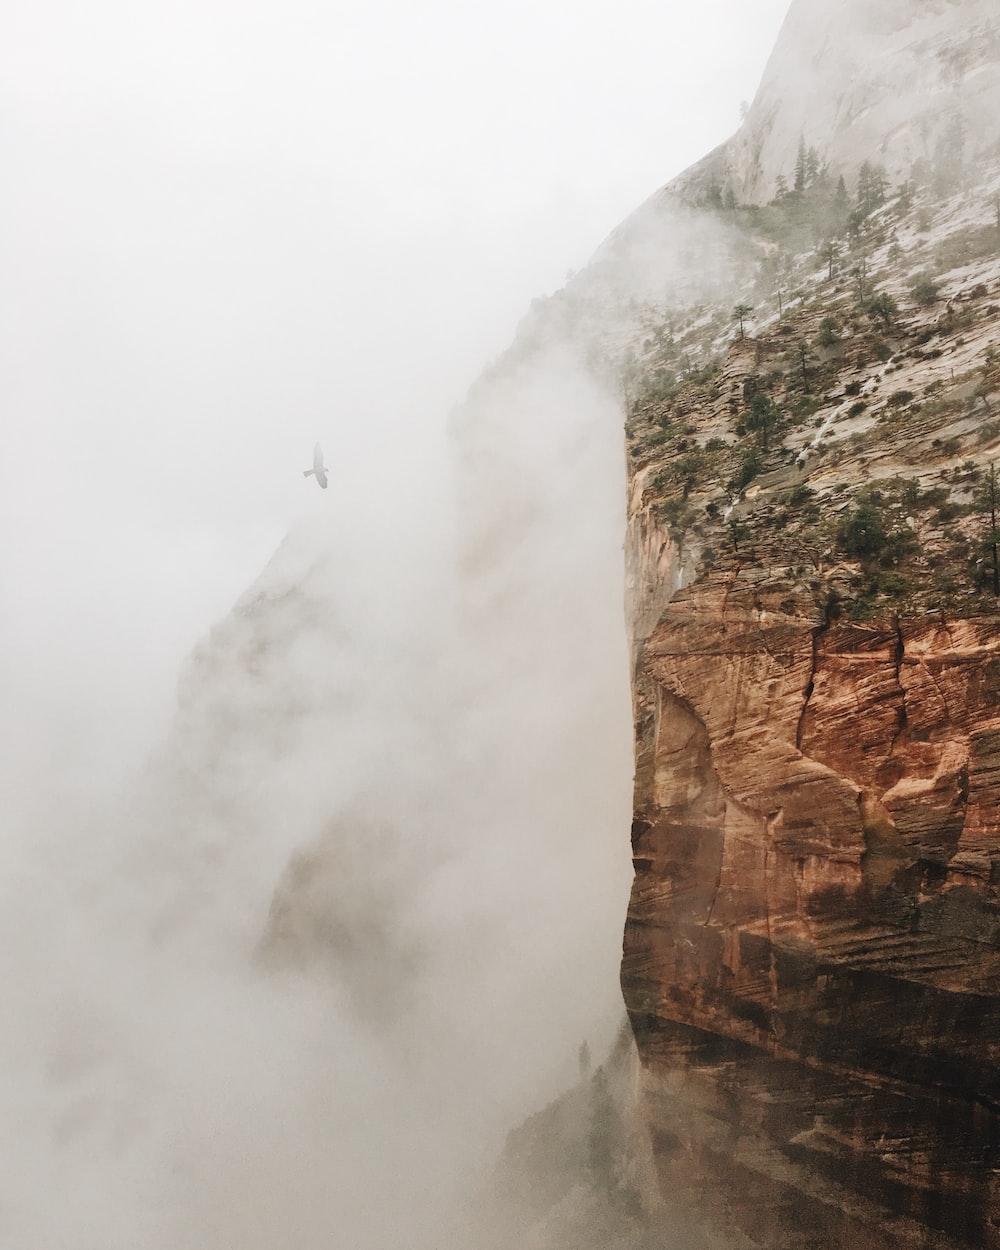 time lapse photography of flying bird near mountain range